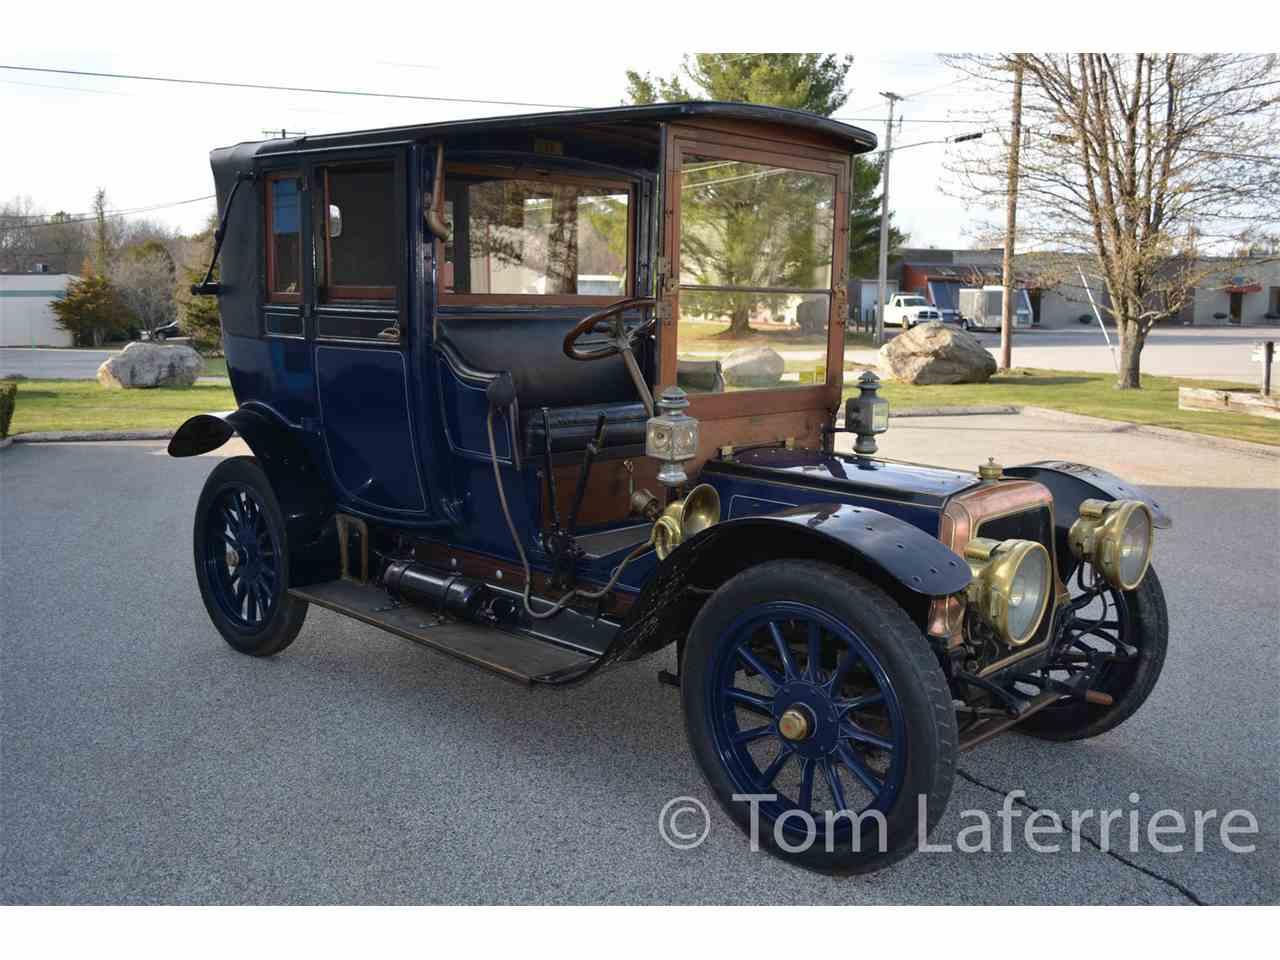 Cars For Sale In Ri: 1910 Panhard Levassor Antique For Sale